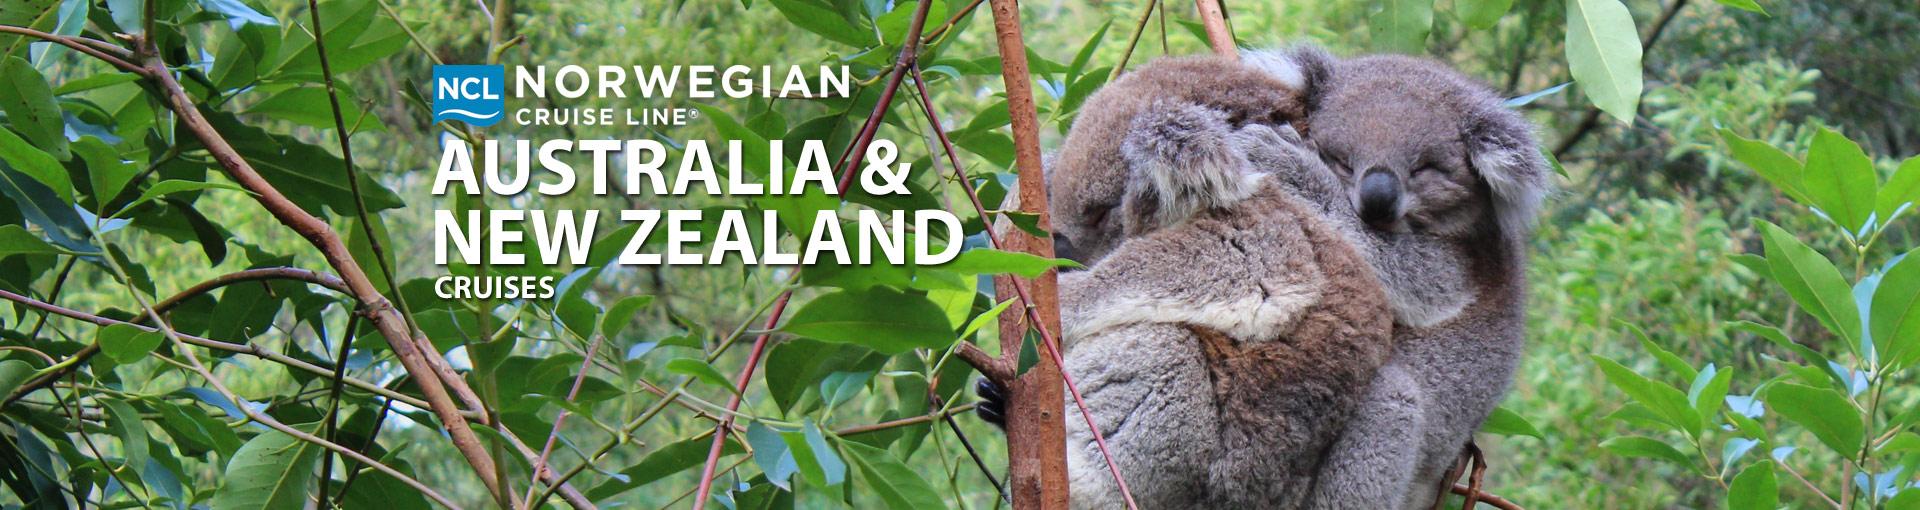 Norwegian Cruise Line Australia and New Zealand